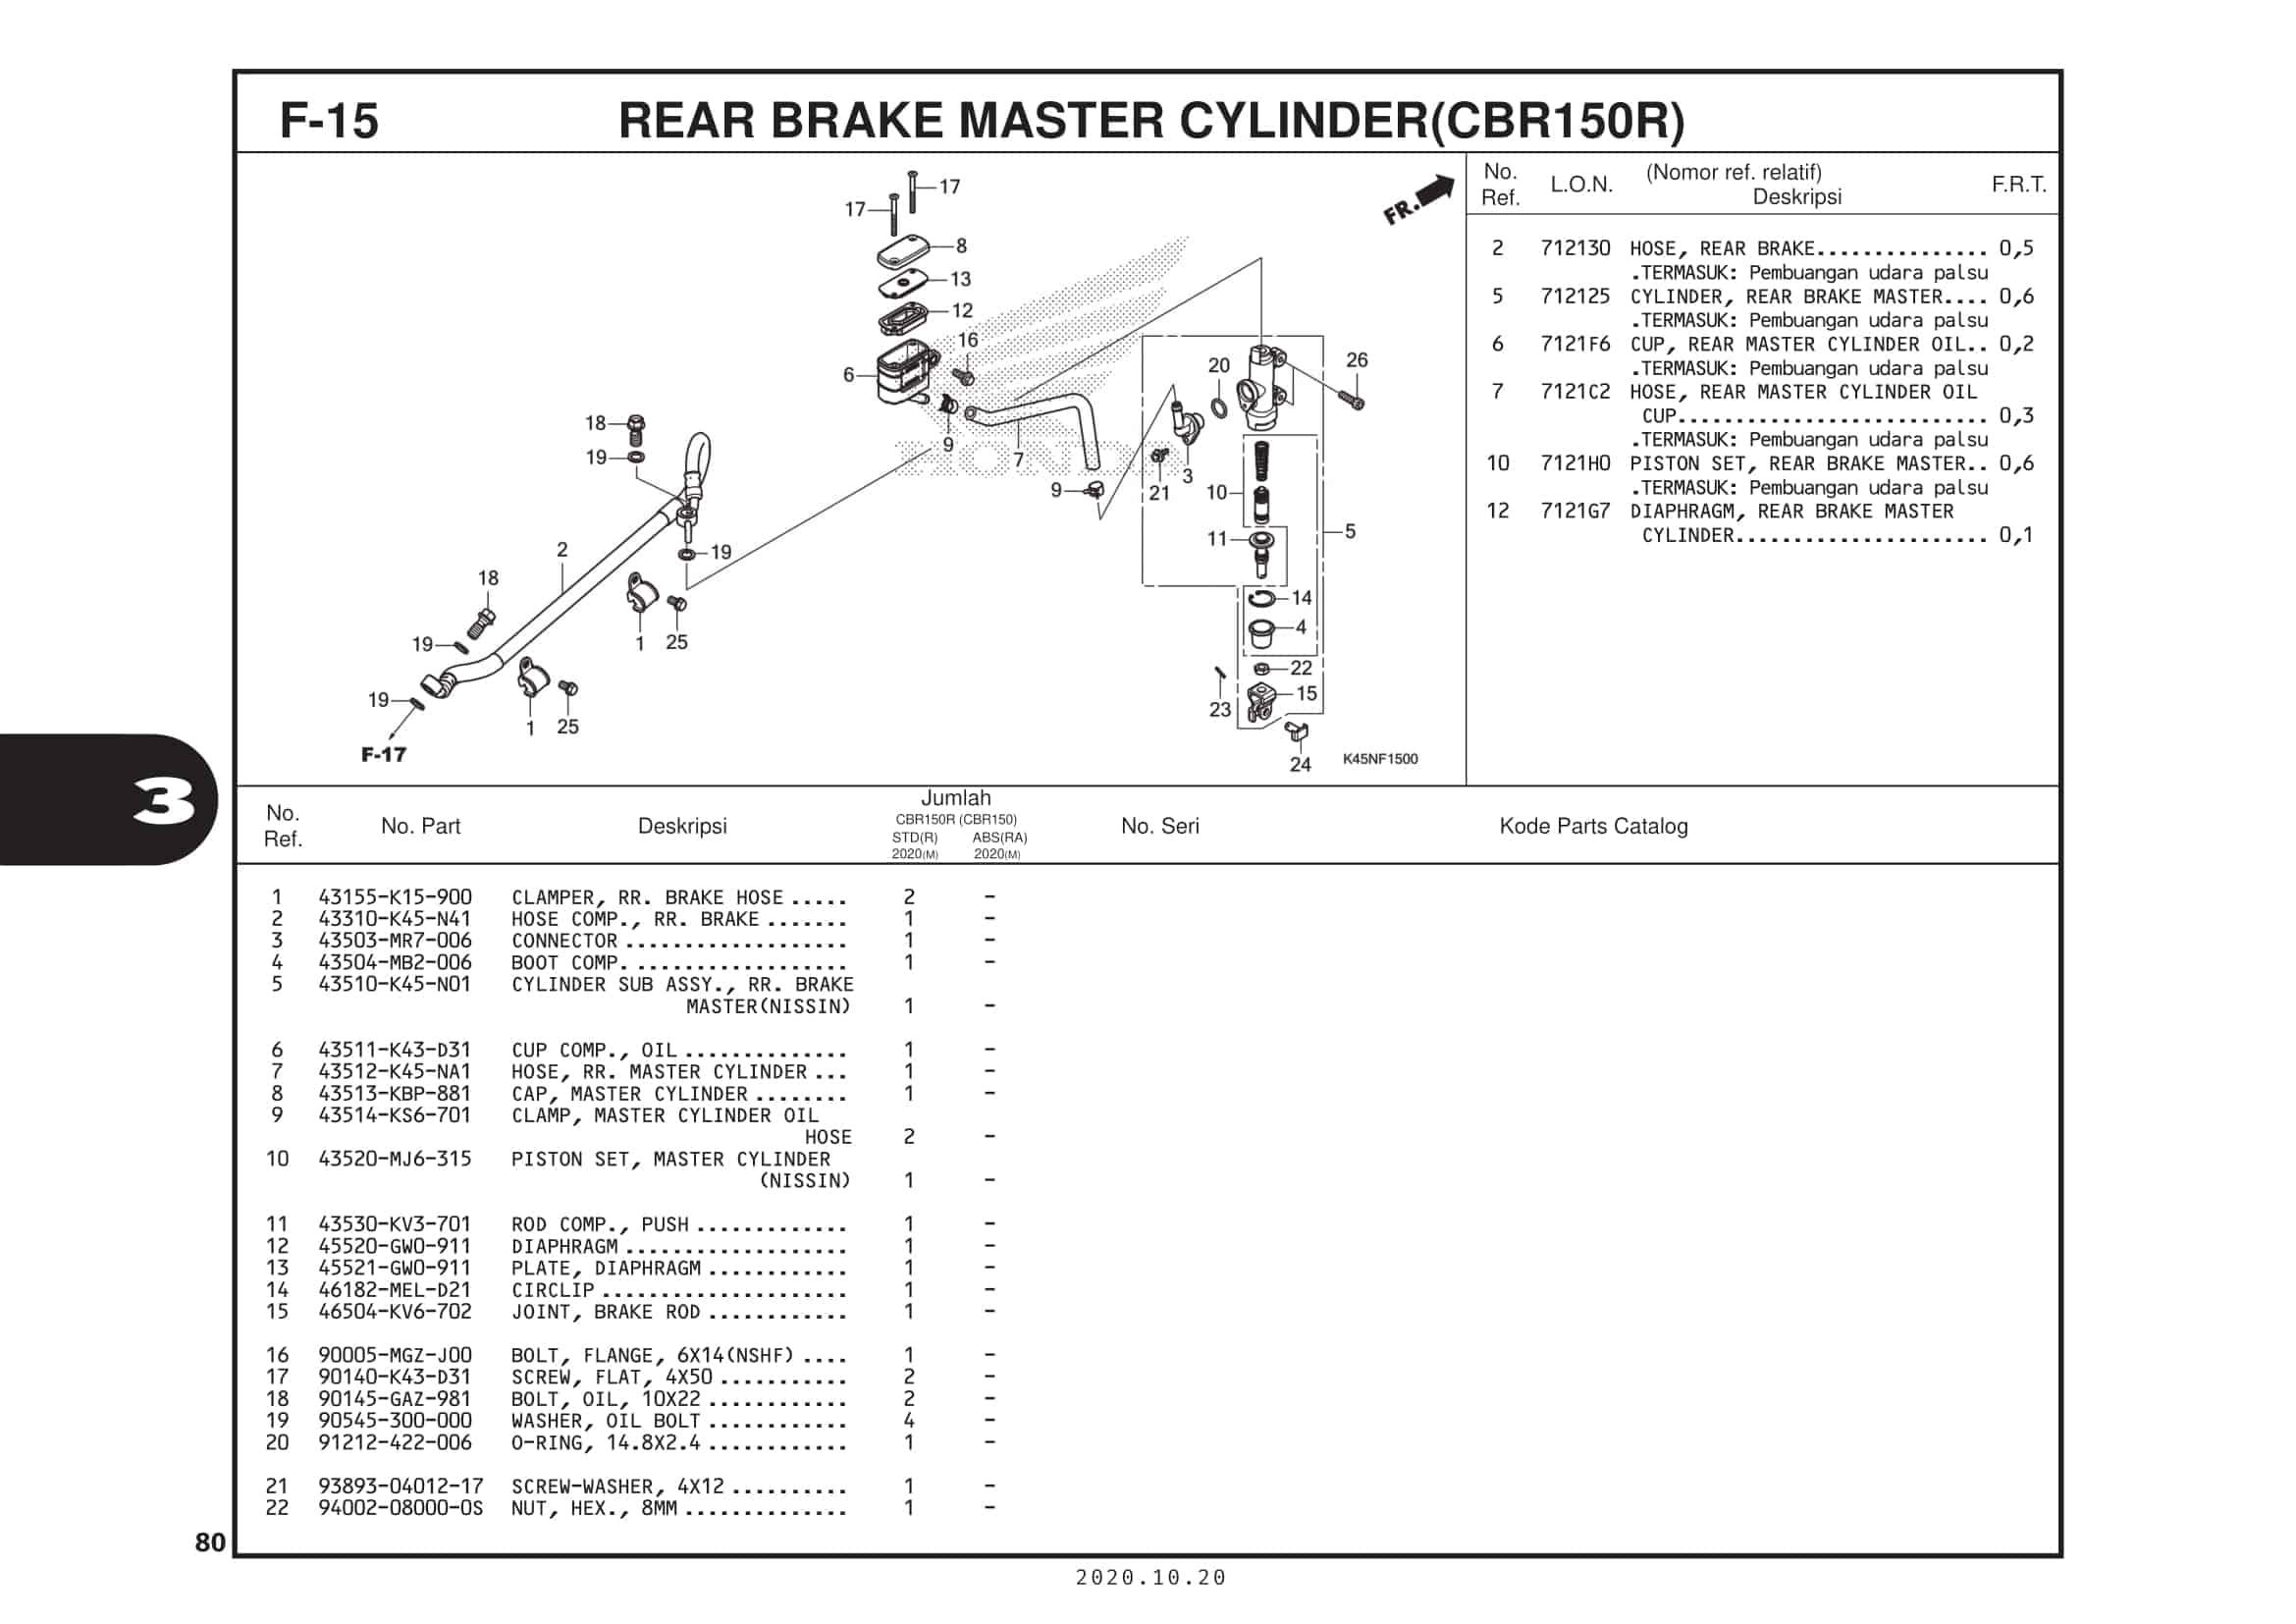 F-15 Rear Brake Master Cylinder (CBR150R)